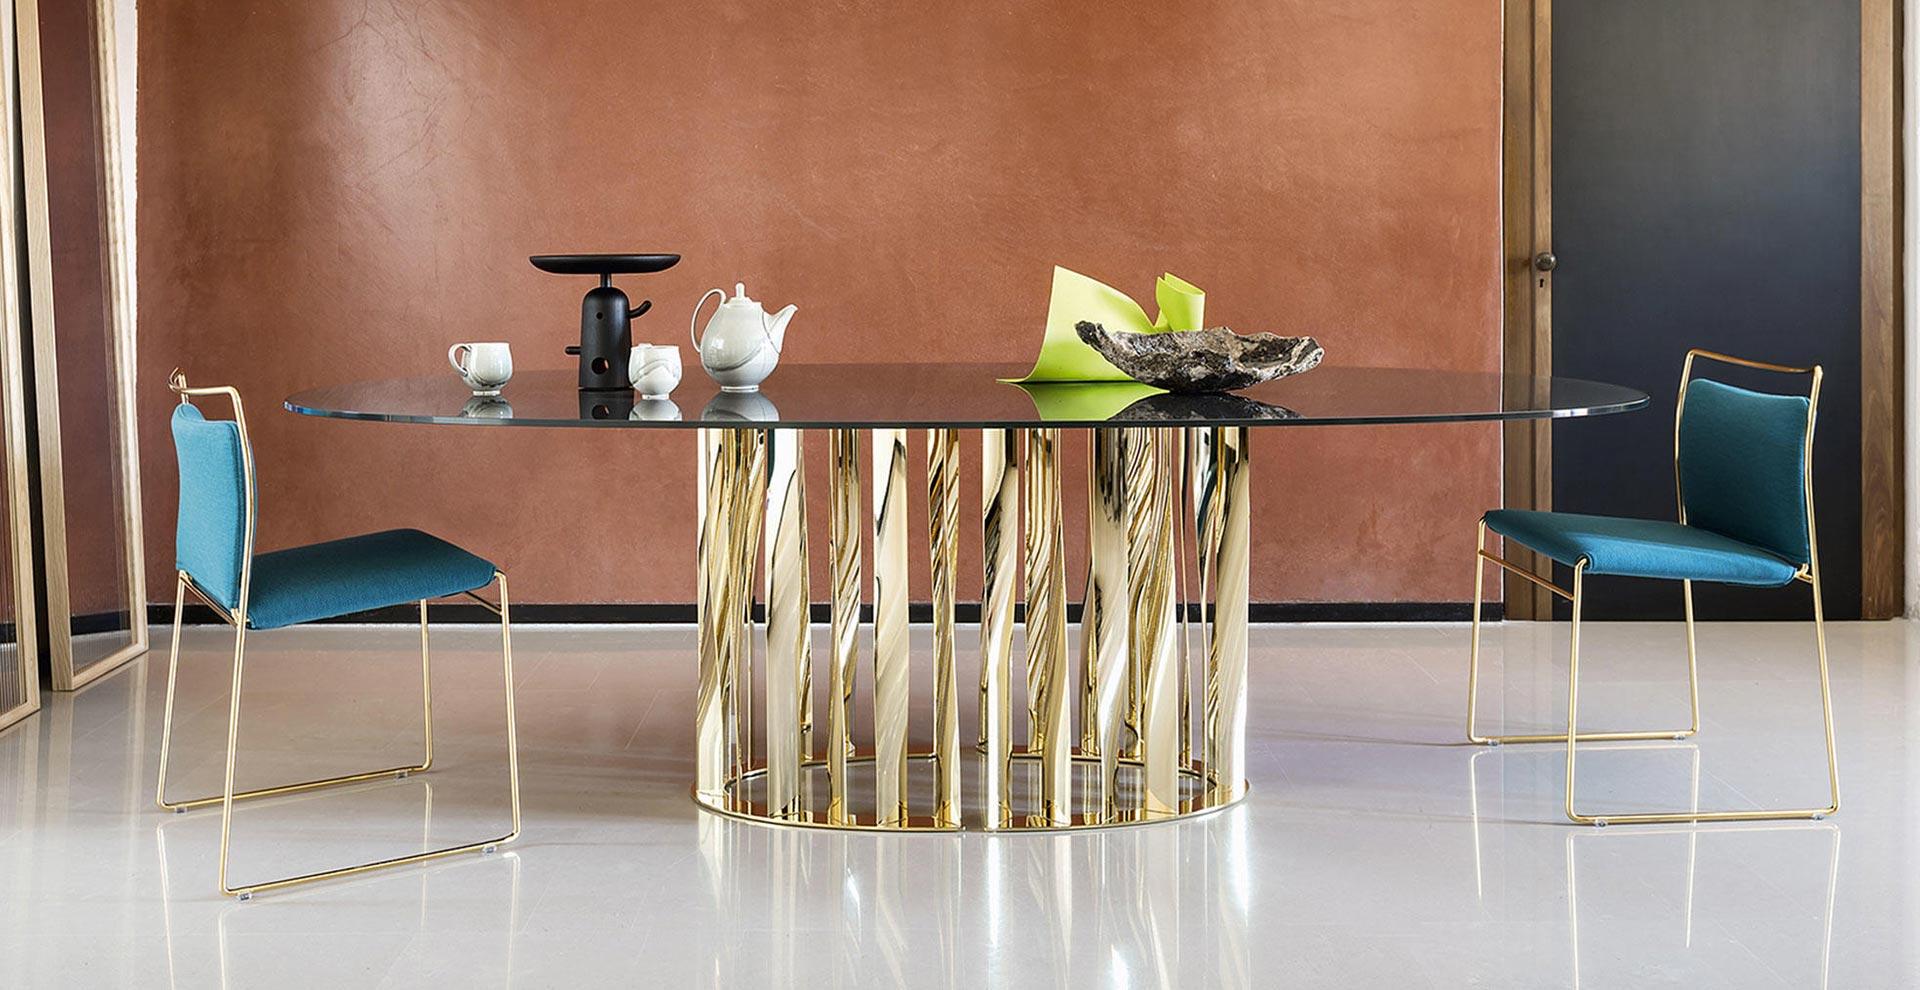 Tavoli Da Pranzo Cassina.Tavoli Cassina Knoll International Poltrona Frau Maxalto Mdf Italia